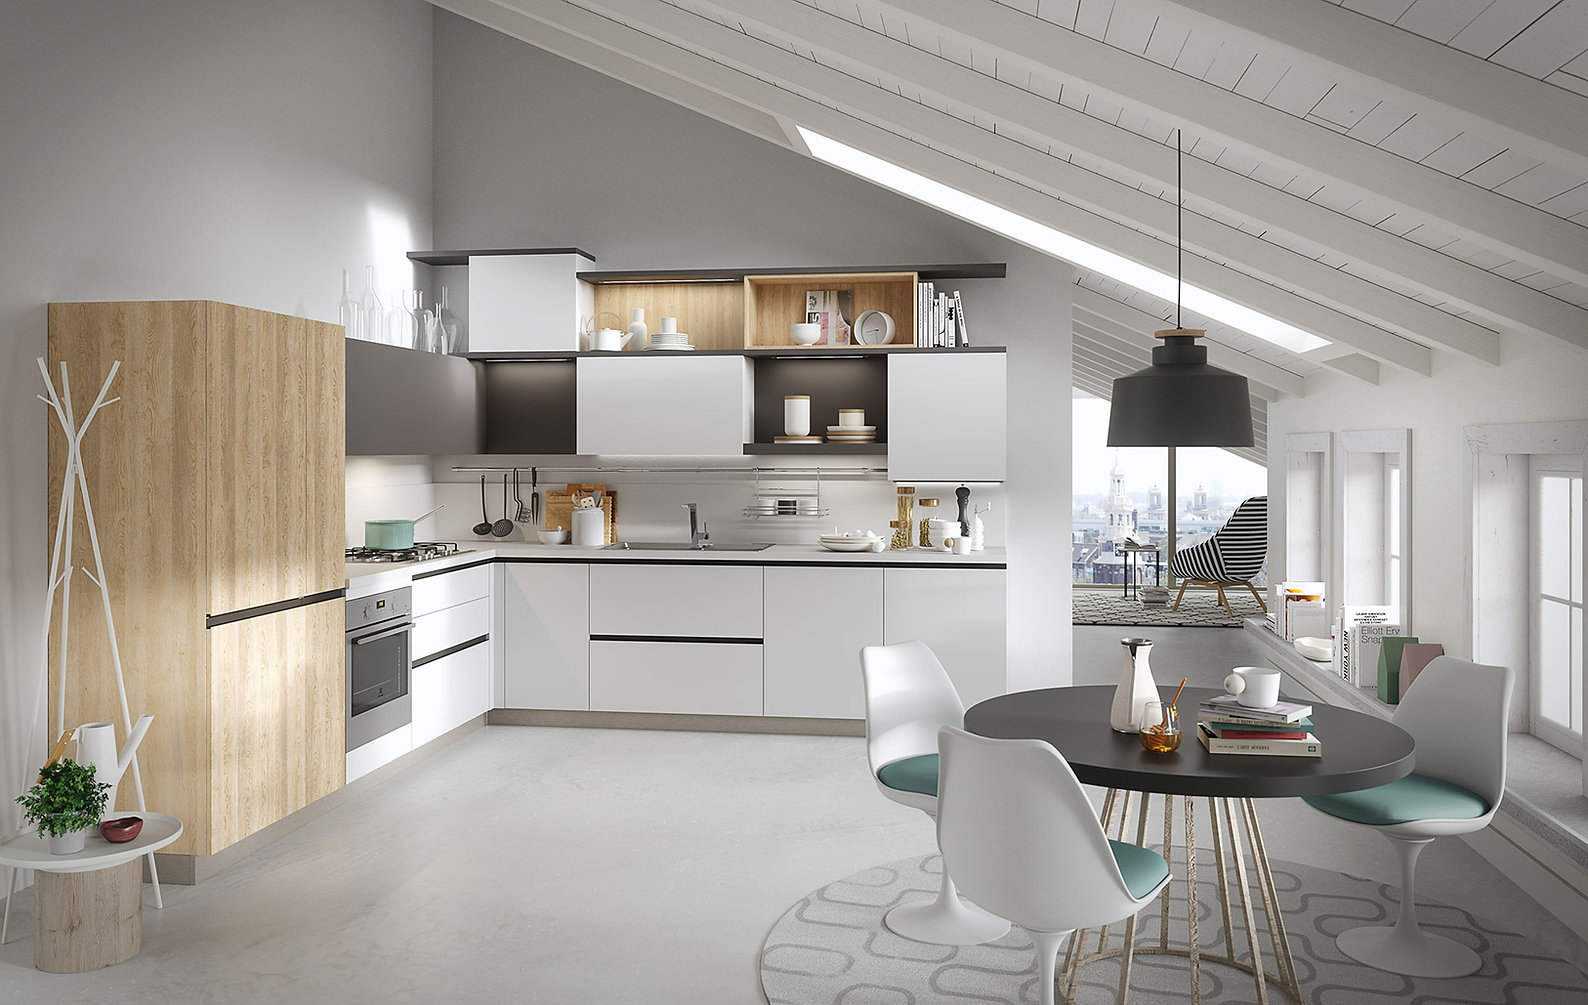 cucine-complete-joy-snaidero-1.jpg